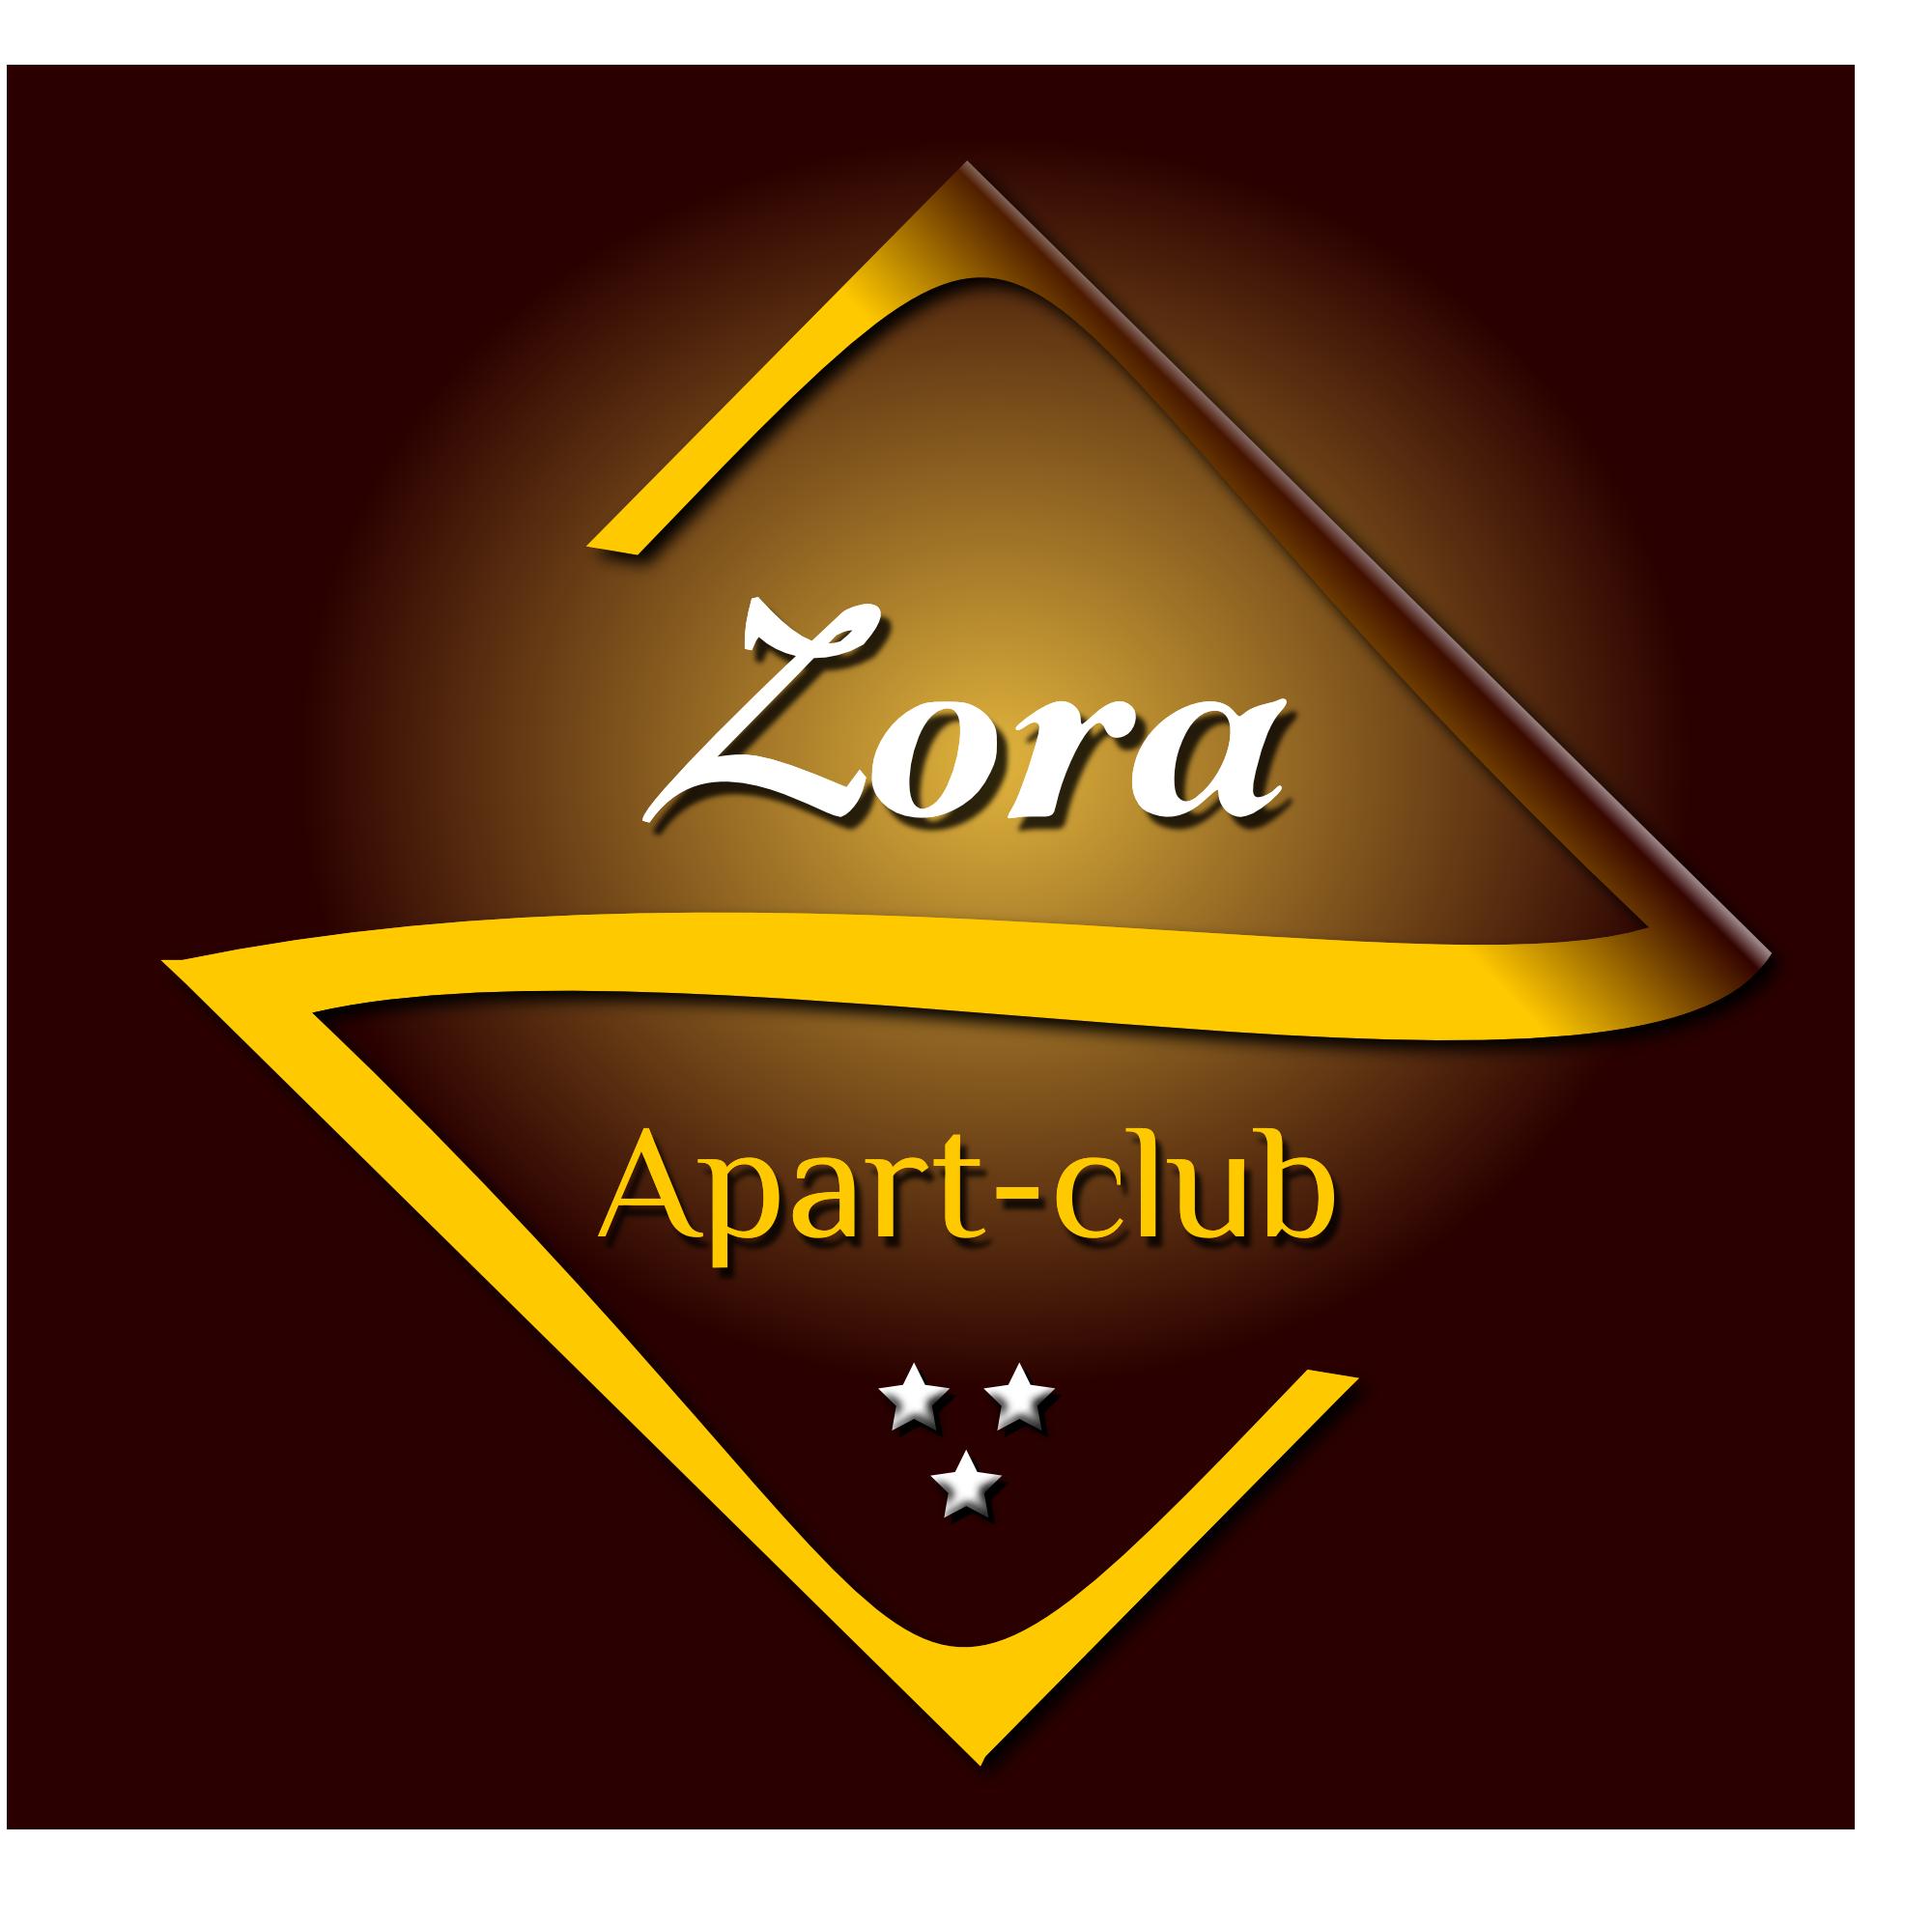 Zora Apart-club